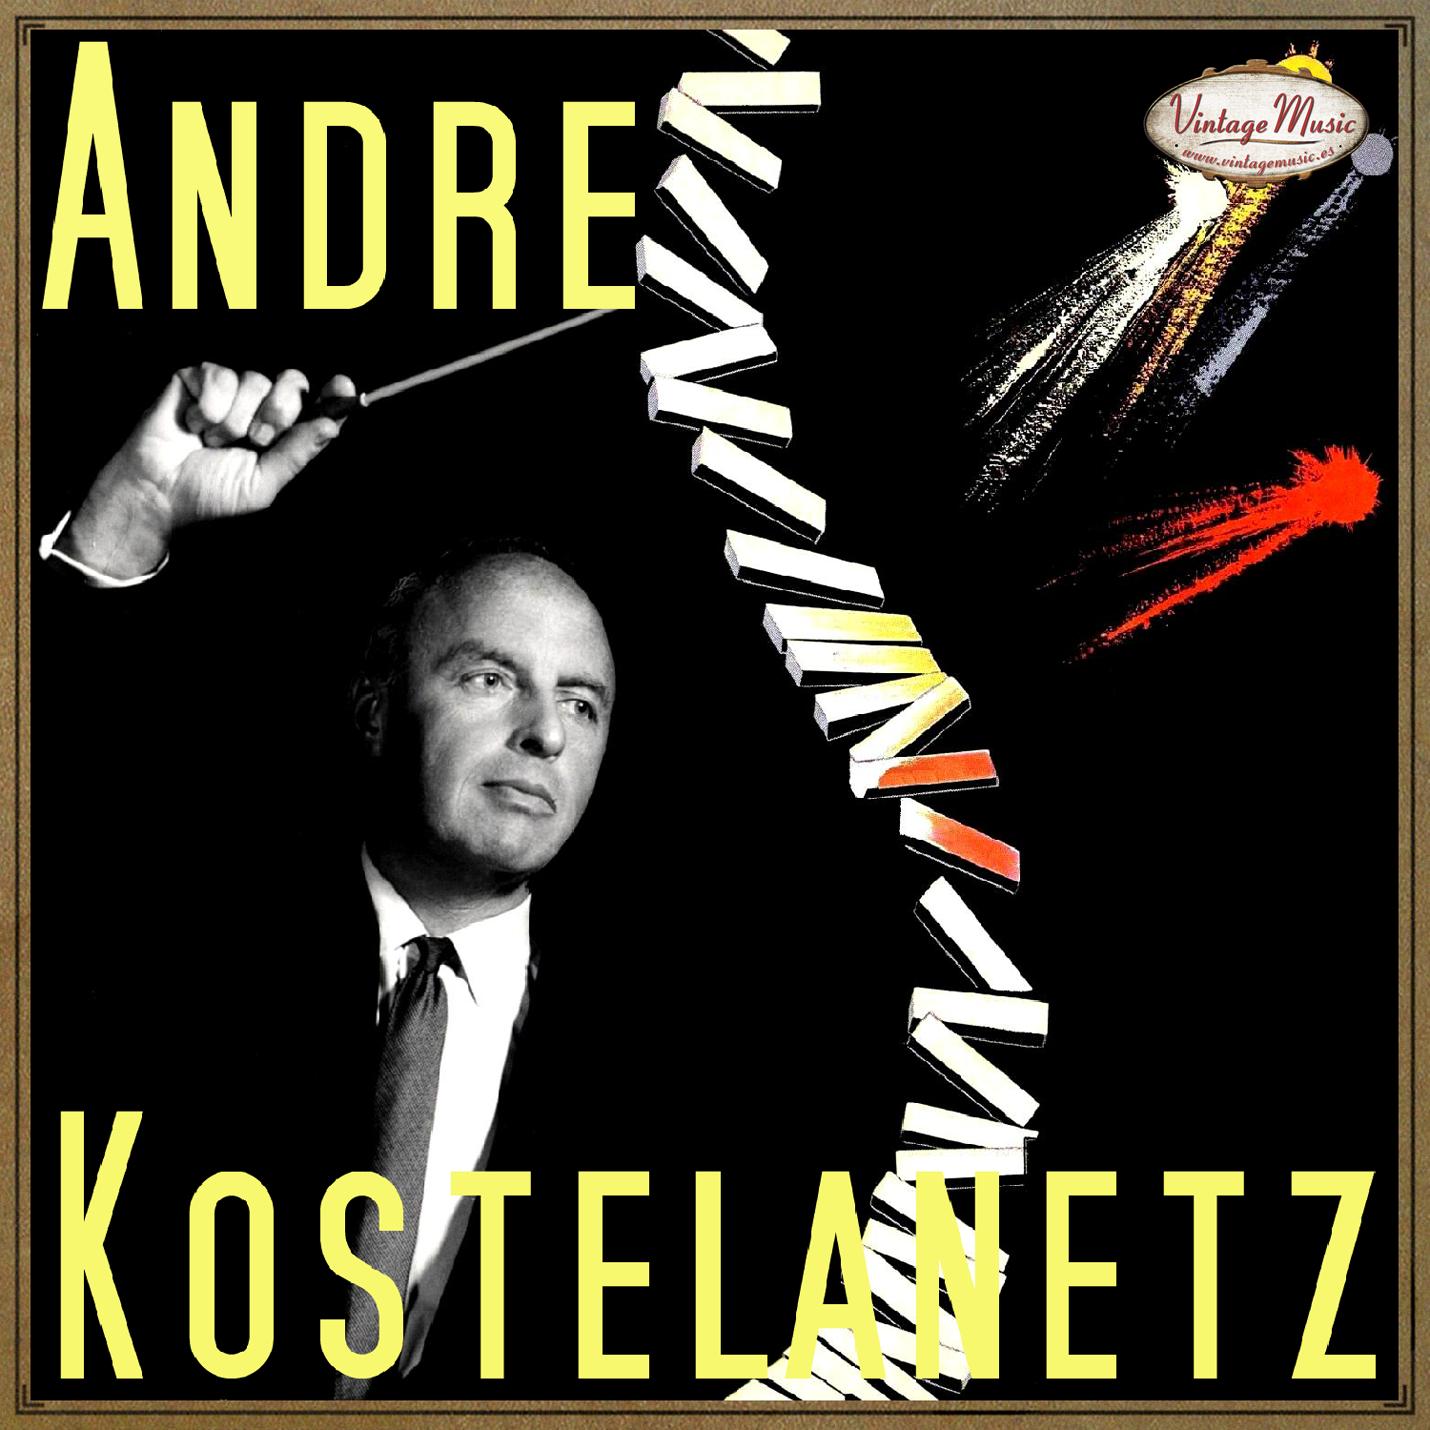 Andre Kostelanetz - ANDRE KOSTELANETZ CD Vintage Jazz Swing. Ol' Man River , Smoke Gets In Your Eyes , Who ... - CD